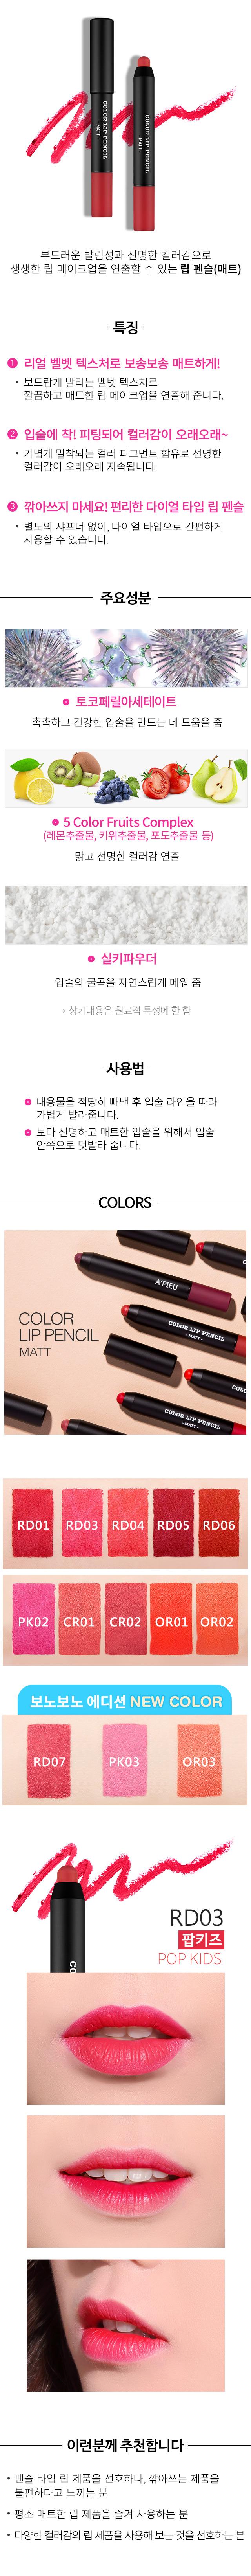 APIEU_Color_Lip_Pencil_Matt_RD03_07.jpg